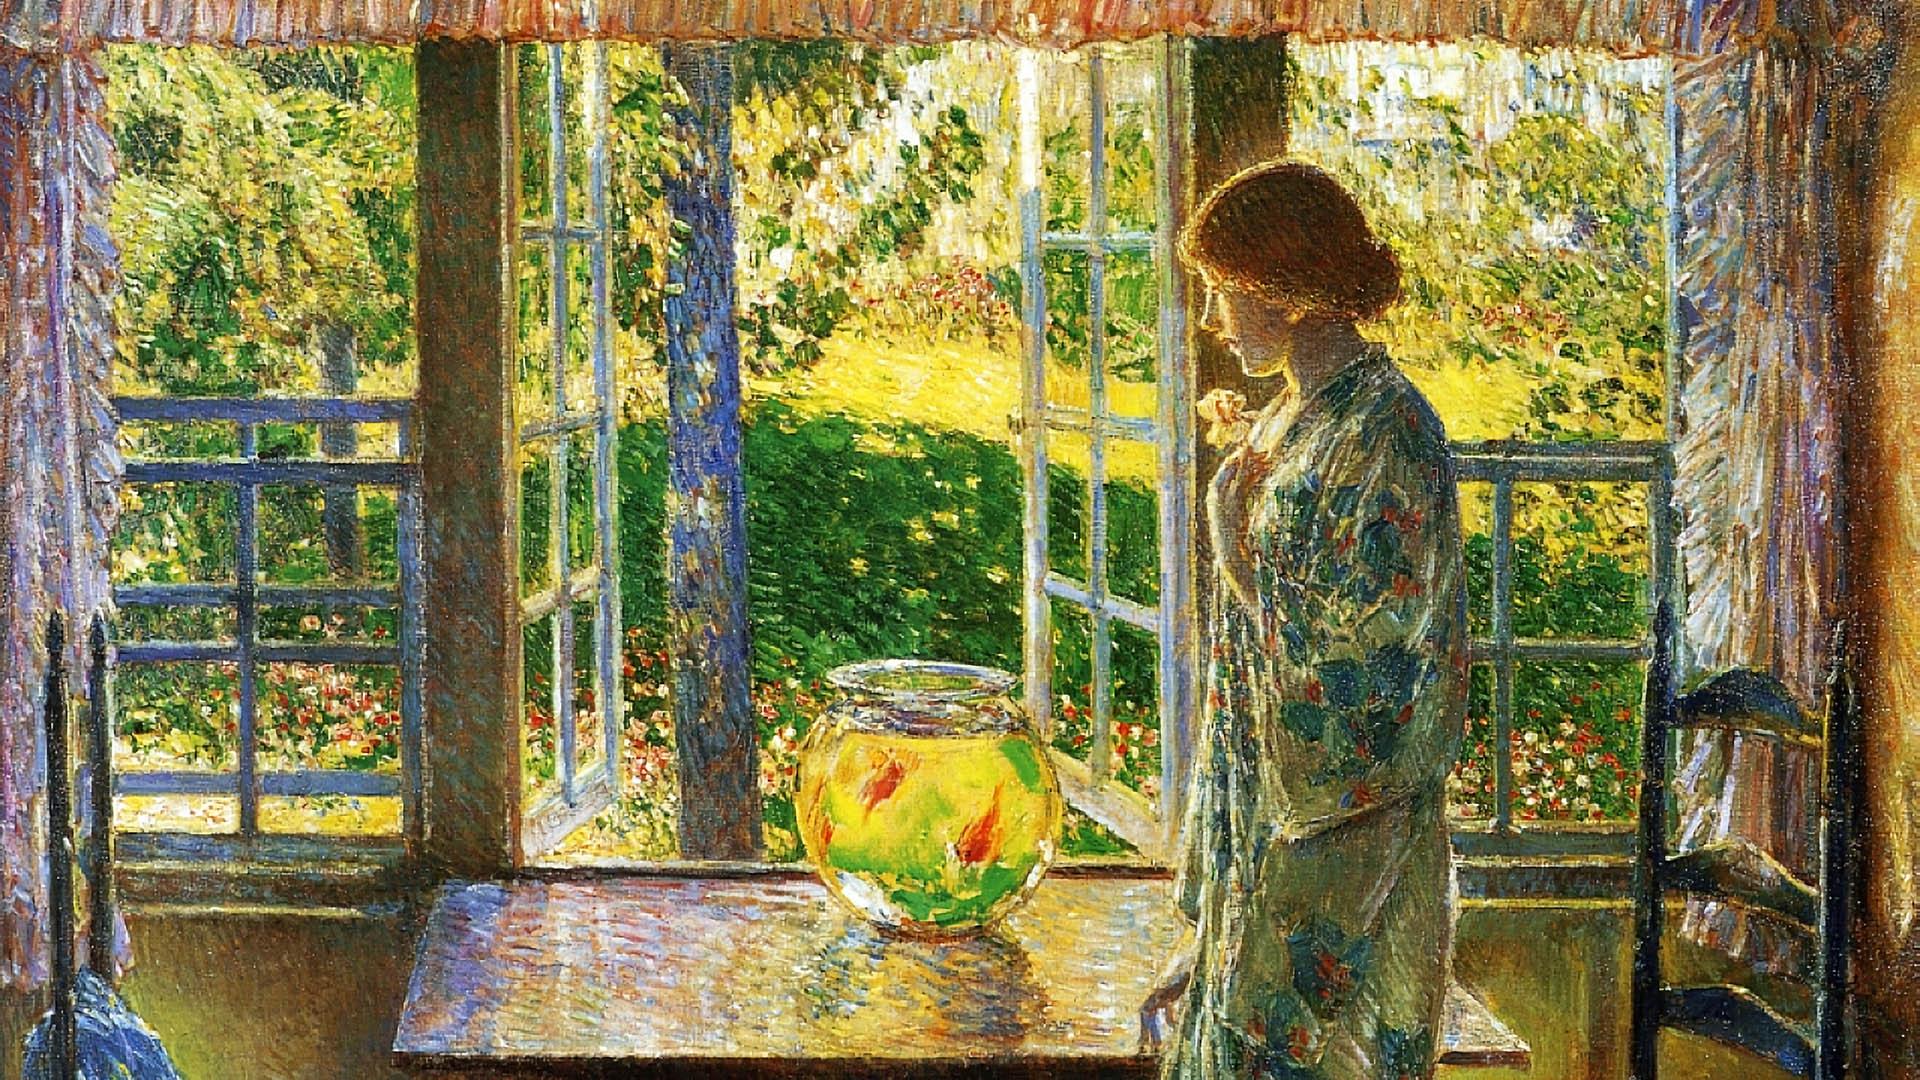 Frederick Childe Hassam - The Goldfish Window 1920x1080